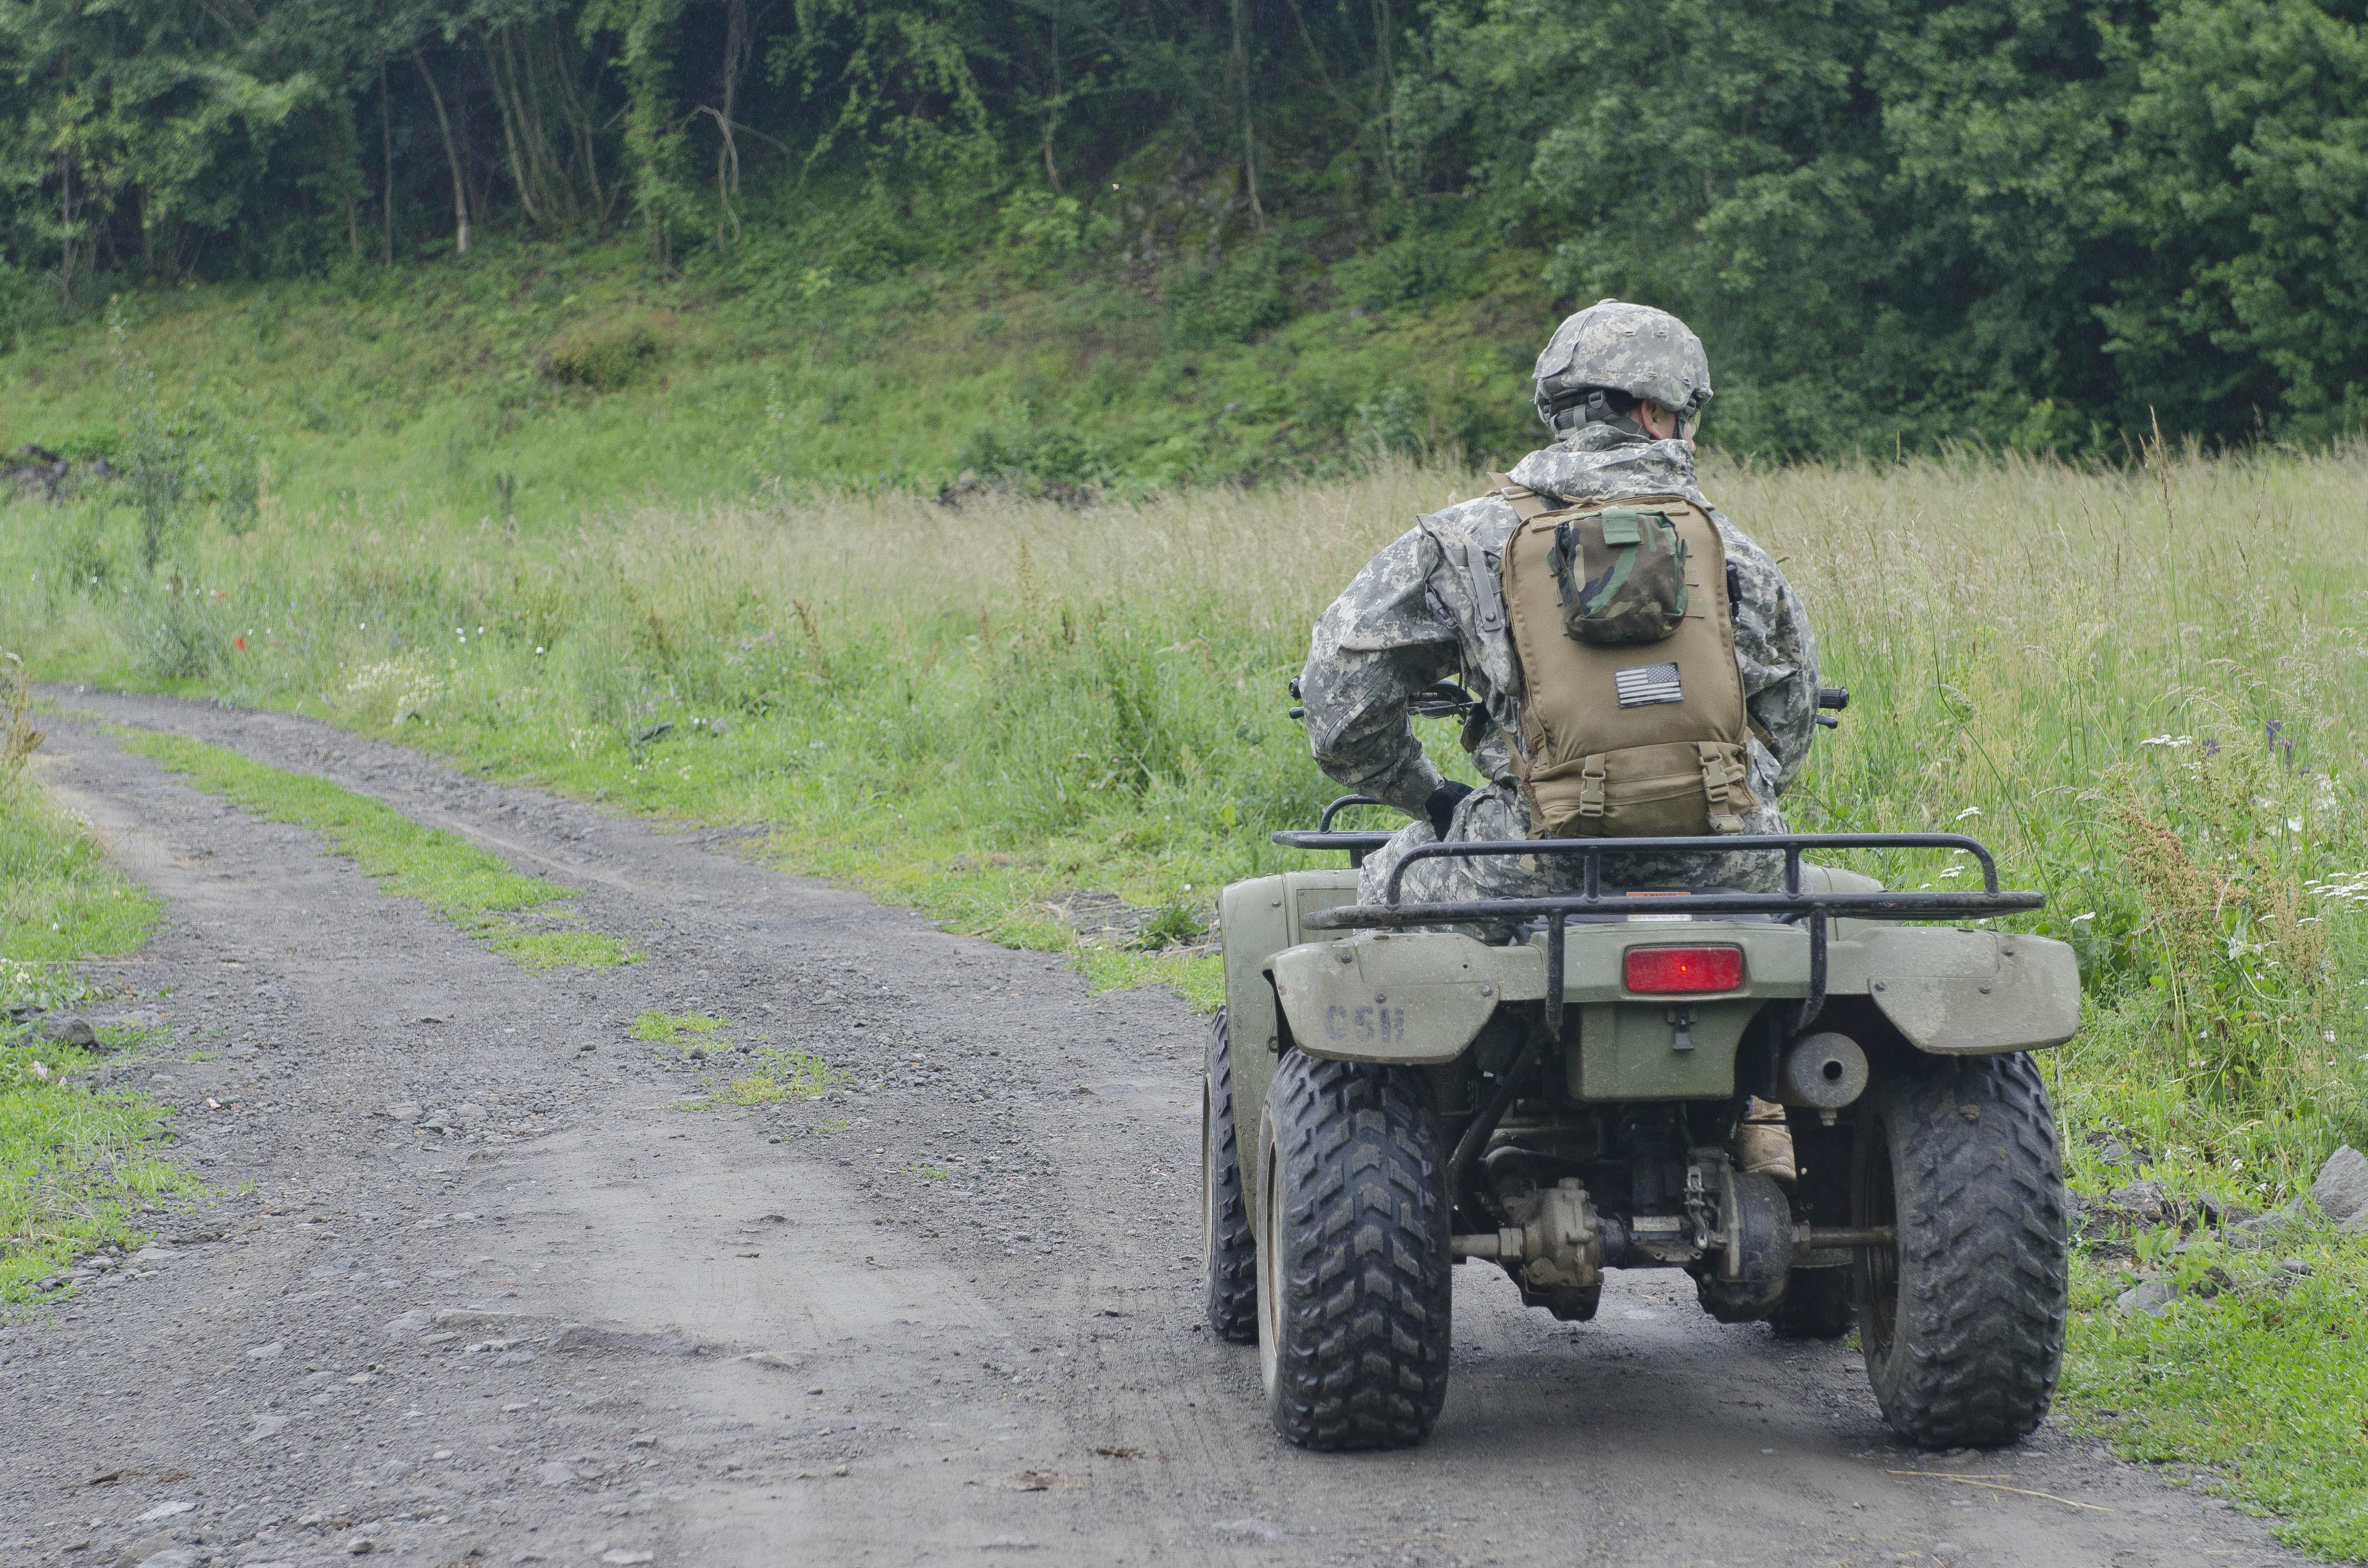 Soldier riding an ATC down a dirt road.